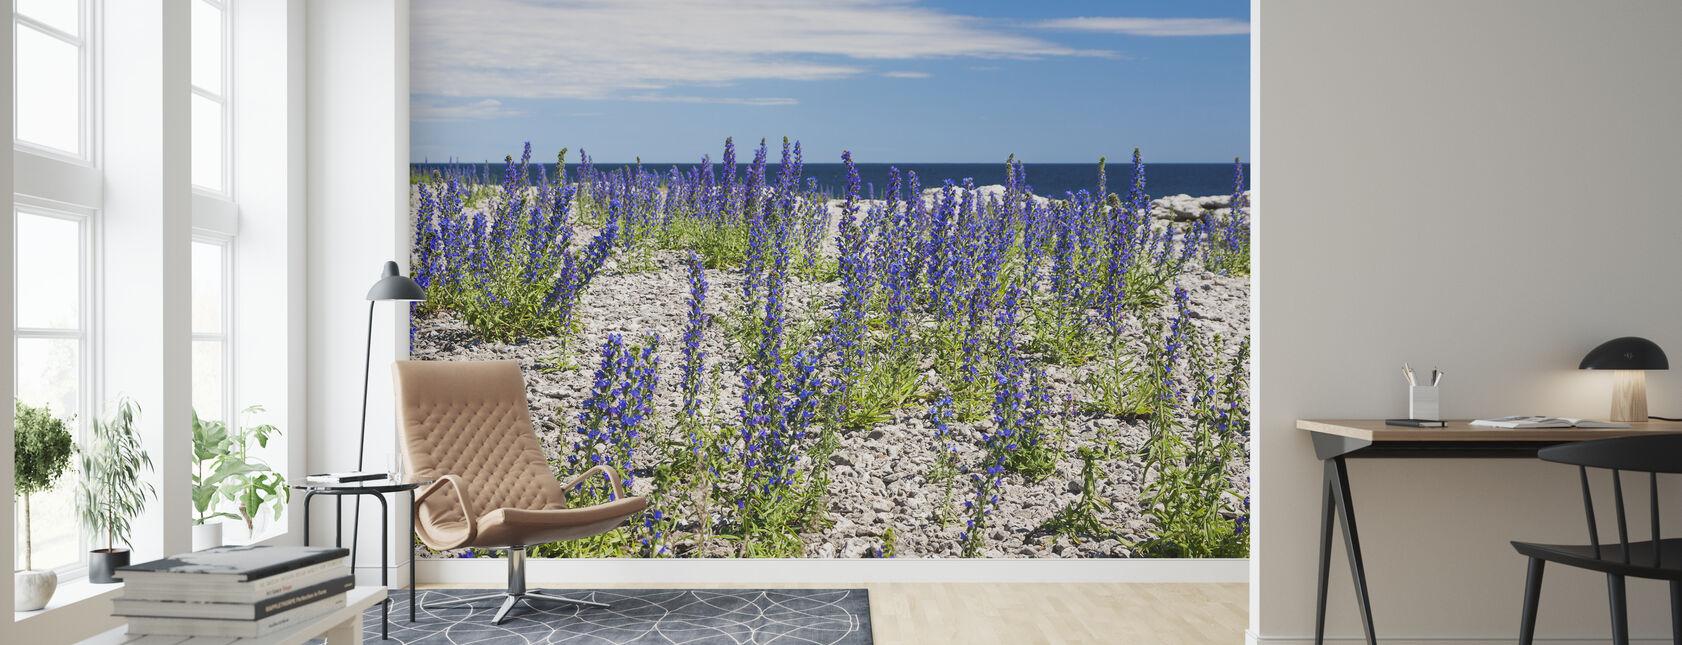 Blueweed - Wallpaper - Living Room